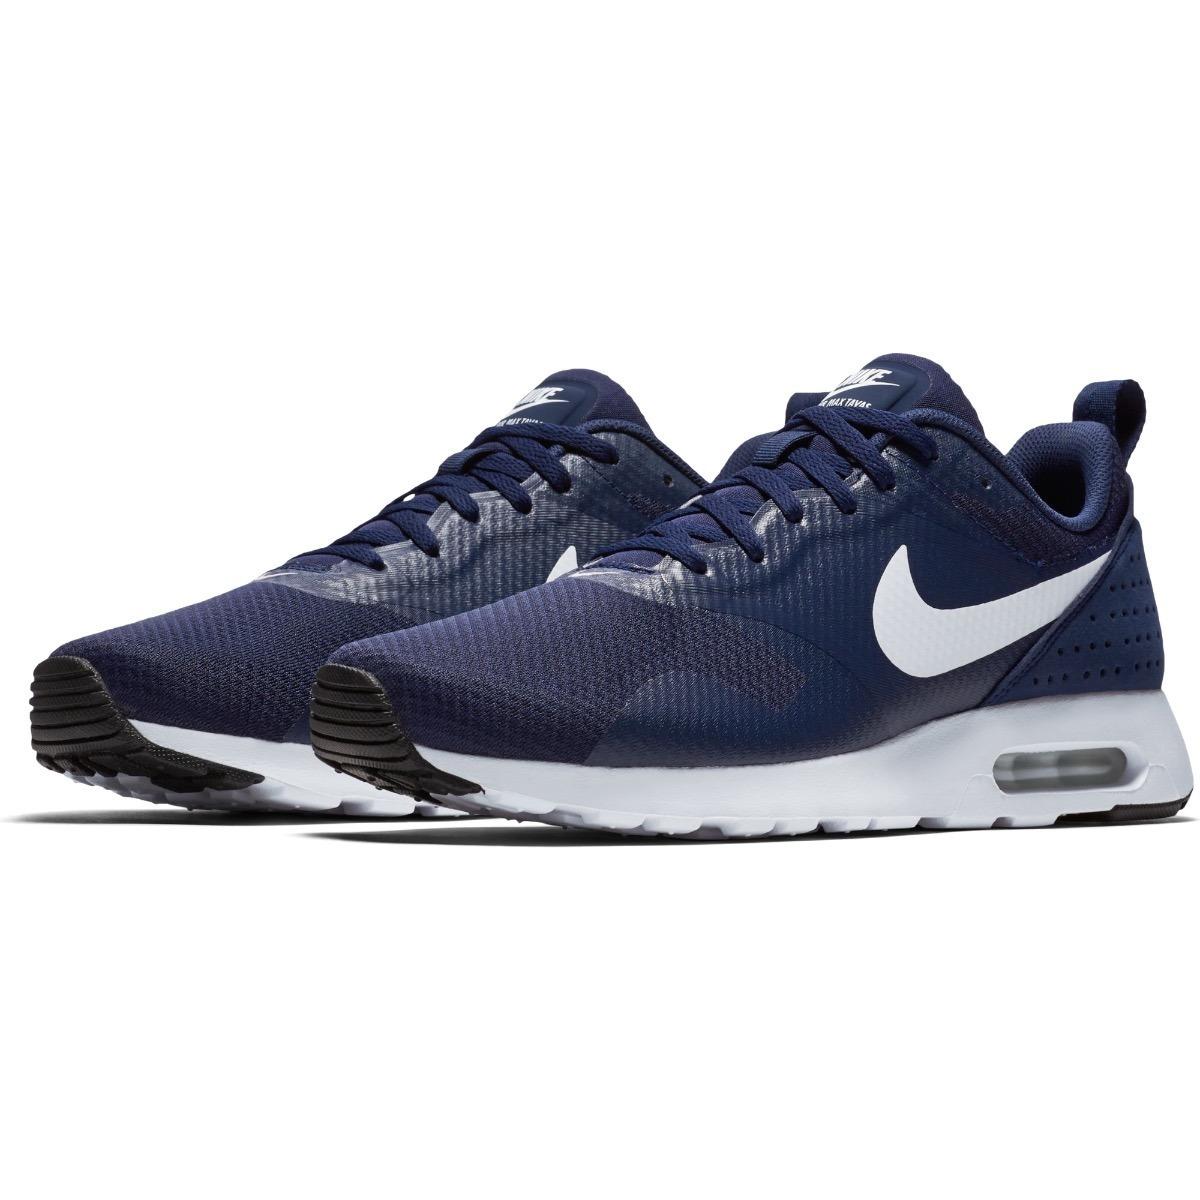 Tenis Nuevos Originales Casual Nike Air Max Tavas Azules